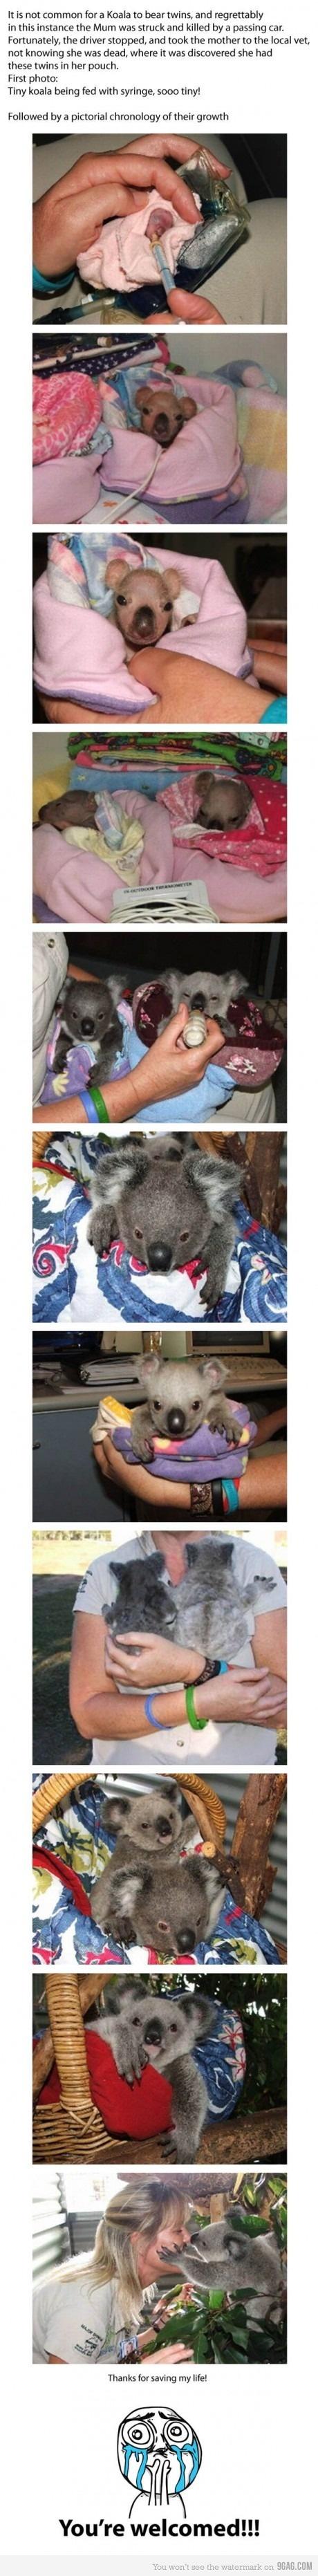 Amazing Stories, Baby Koalas, Koalas Rescue, Koala Bears, Adorable, Koalas Twin, Koalas Bears, Awwww, Animal